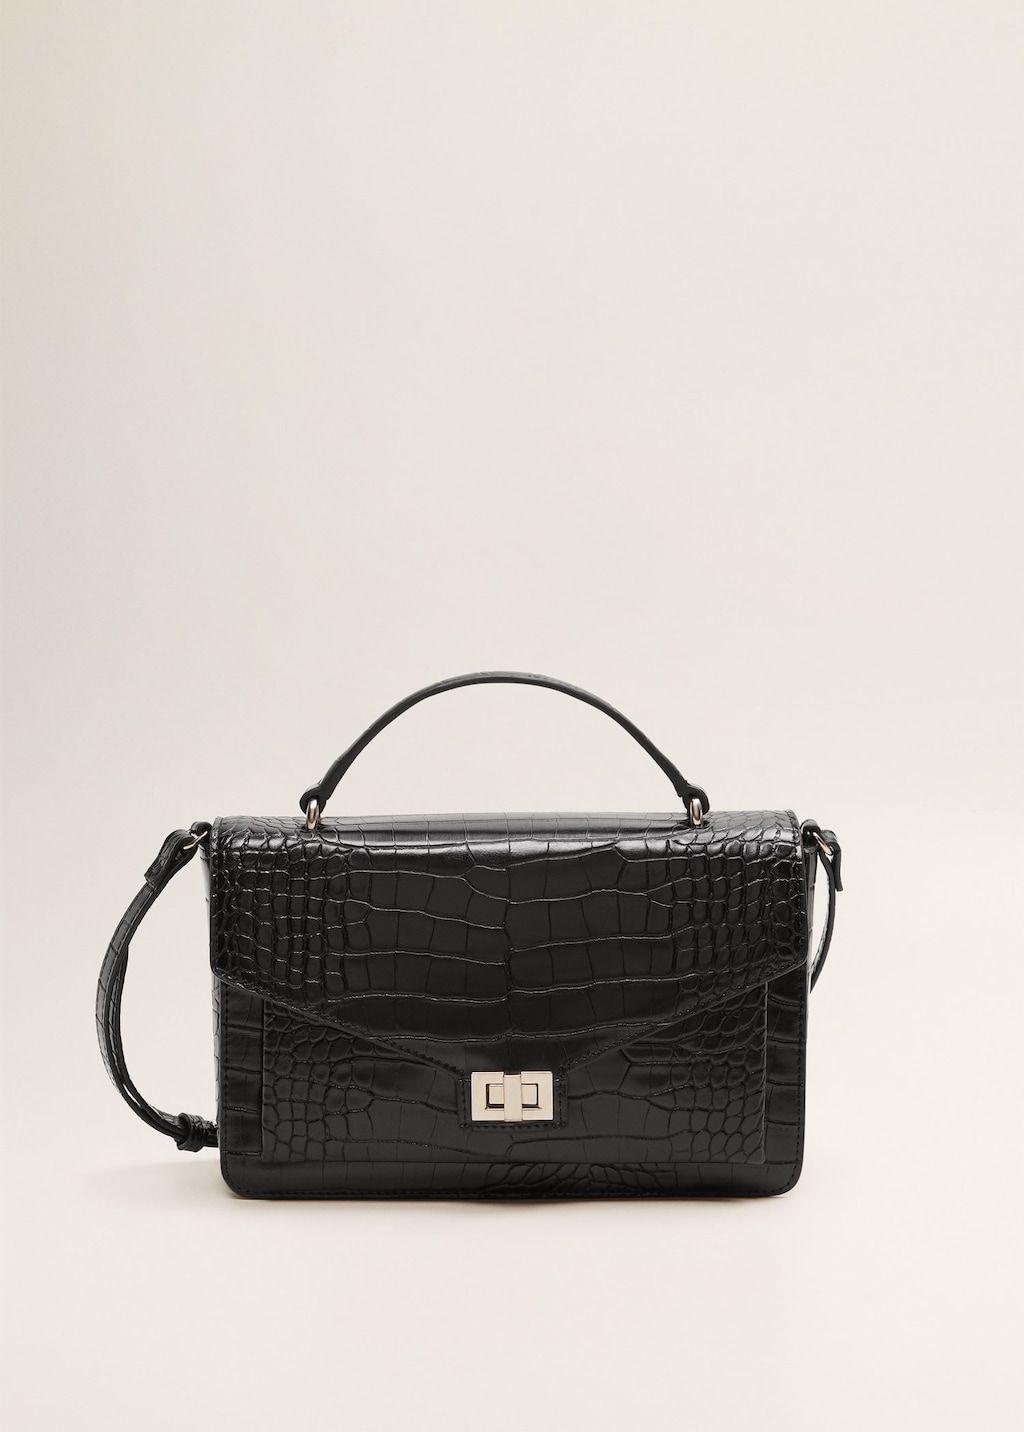 43a74bcbea7 Cross-body croc-effect bag - Women   Workwear   Bags, Hermes ...